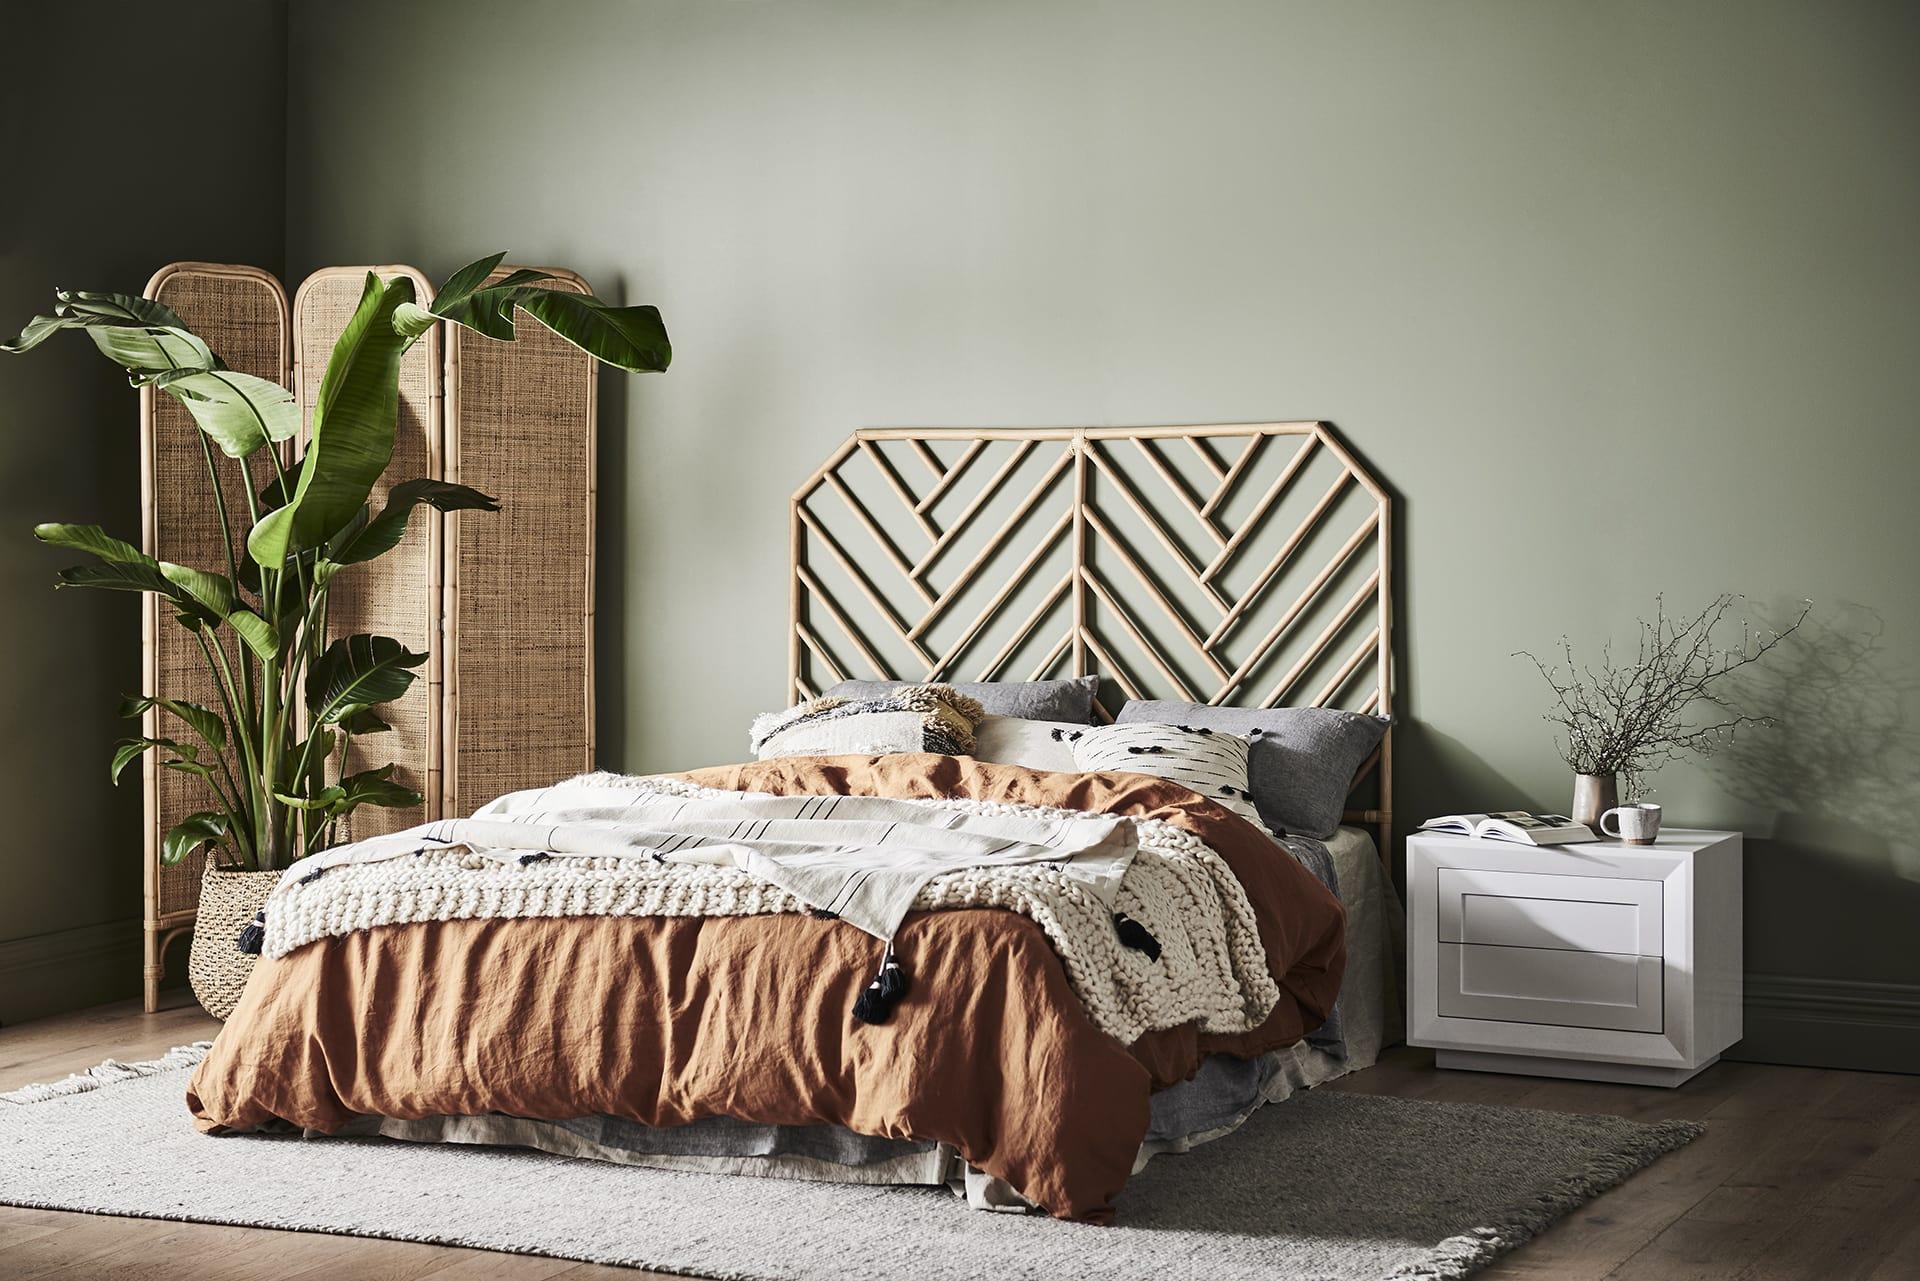 boho luxe bedroom wicker headboard and cane screen in green bedroom from globewest